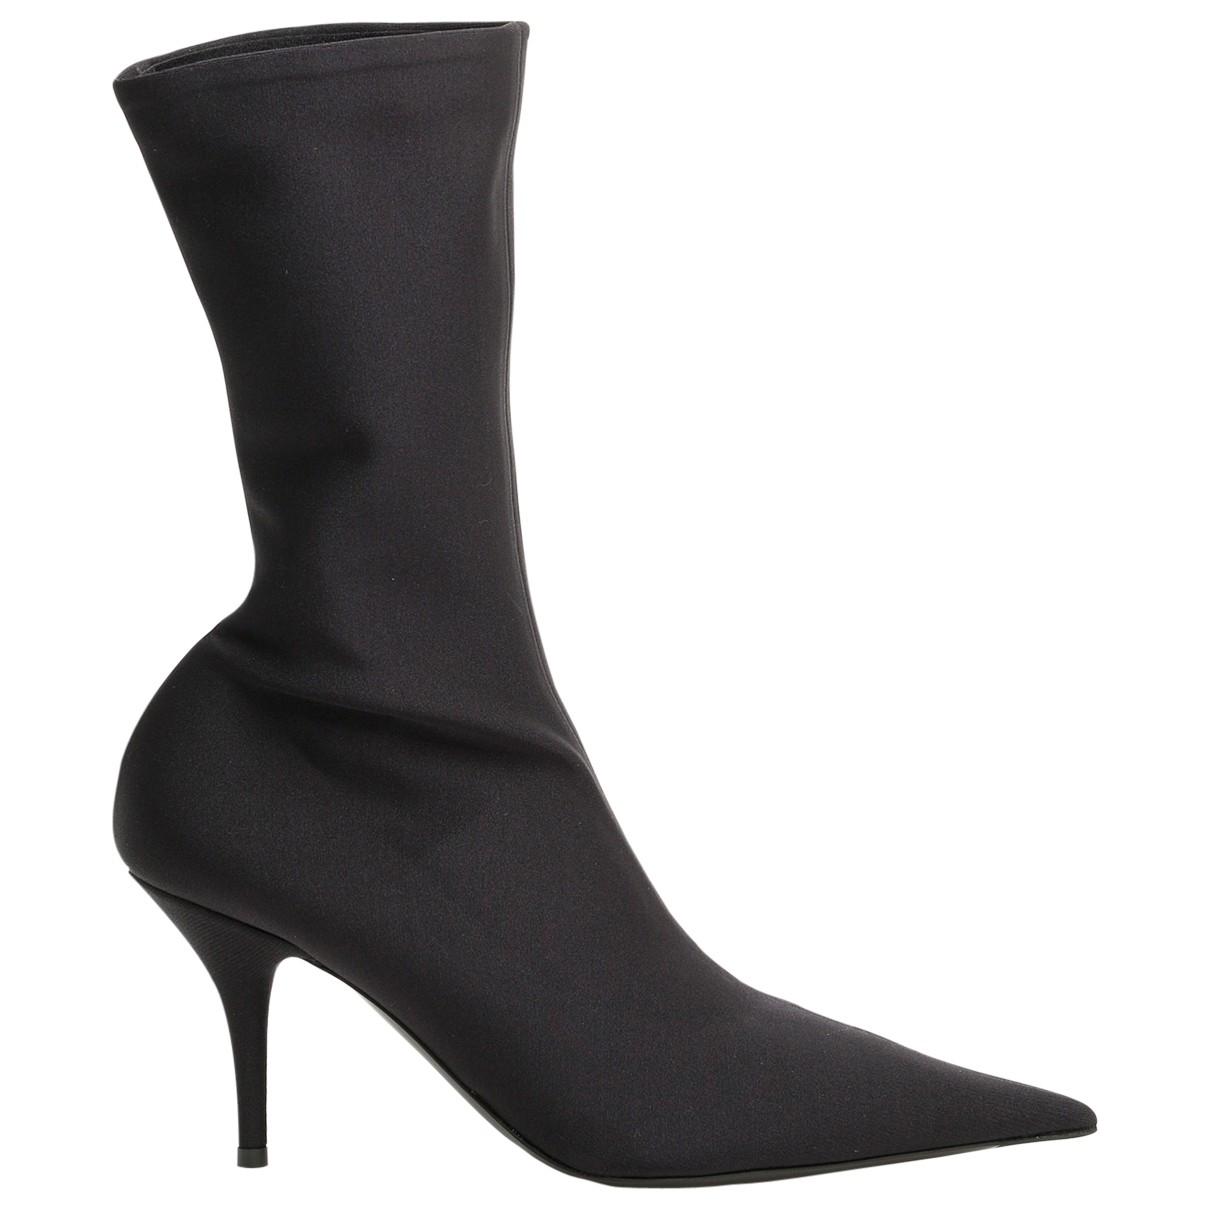 Balenciaga Knife Black Ankle boots for Women 38 EU